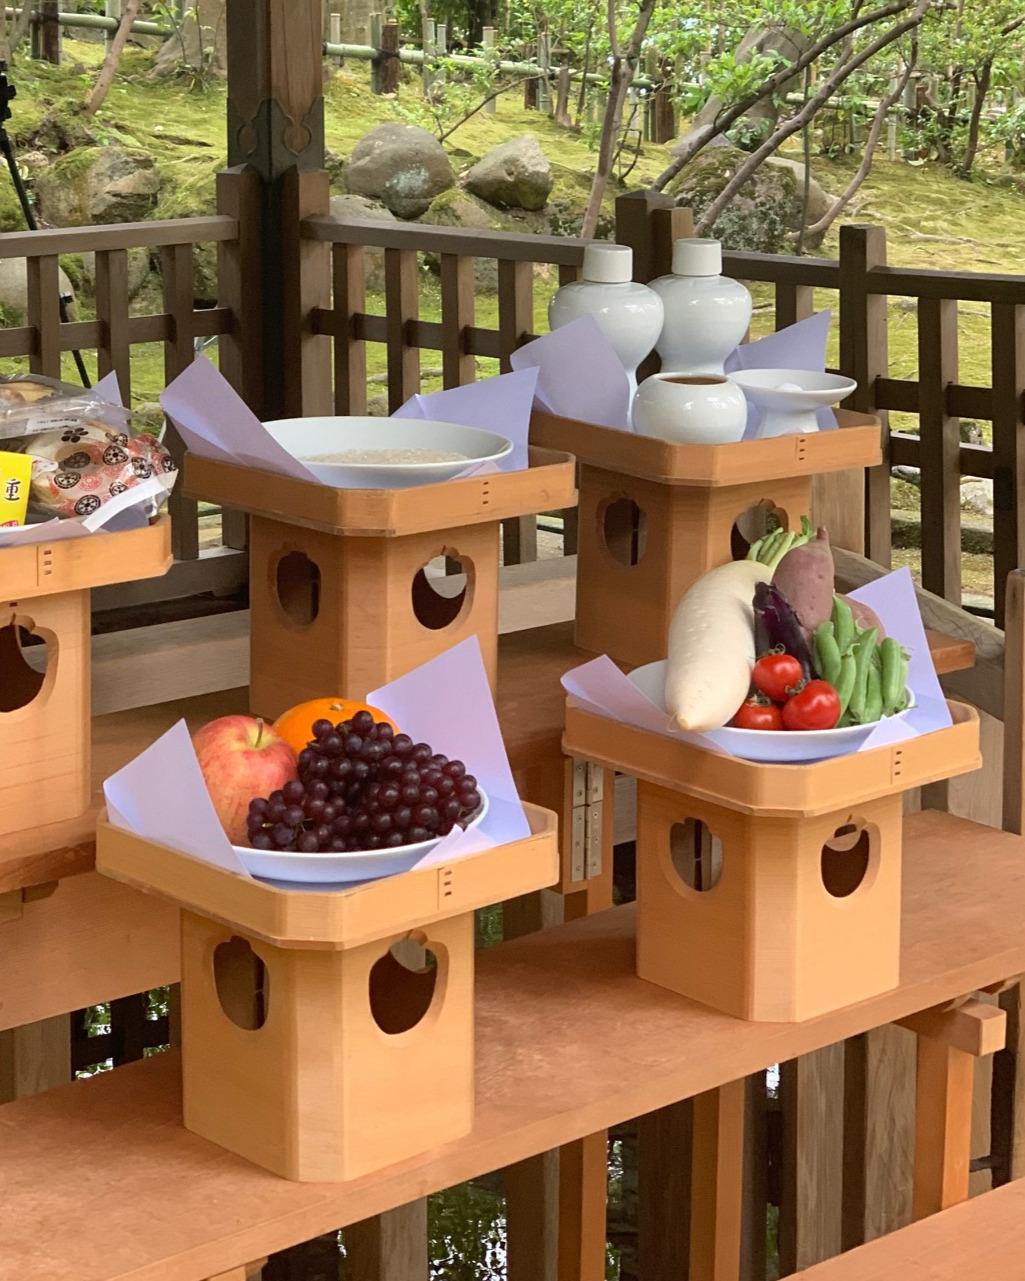 Offerings at the sacred well at Kanazawa Shrine for the start of the Hyakumangoku Festival